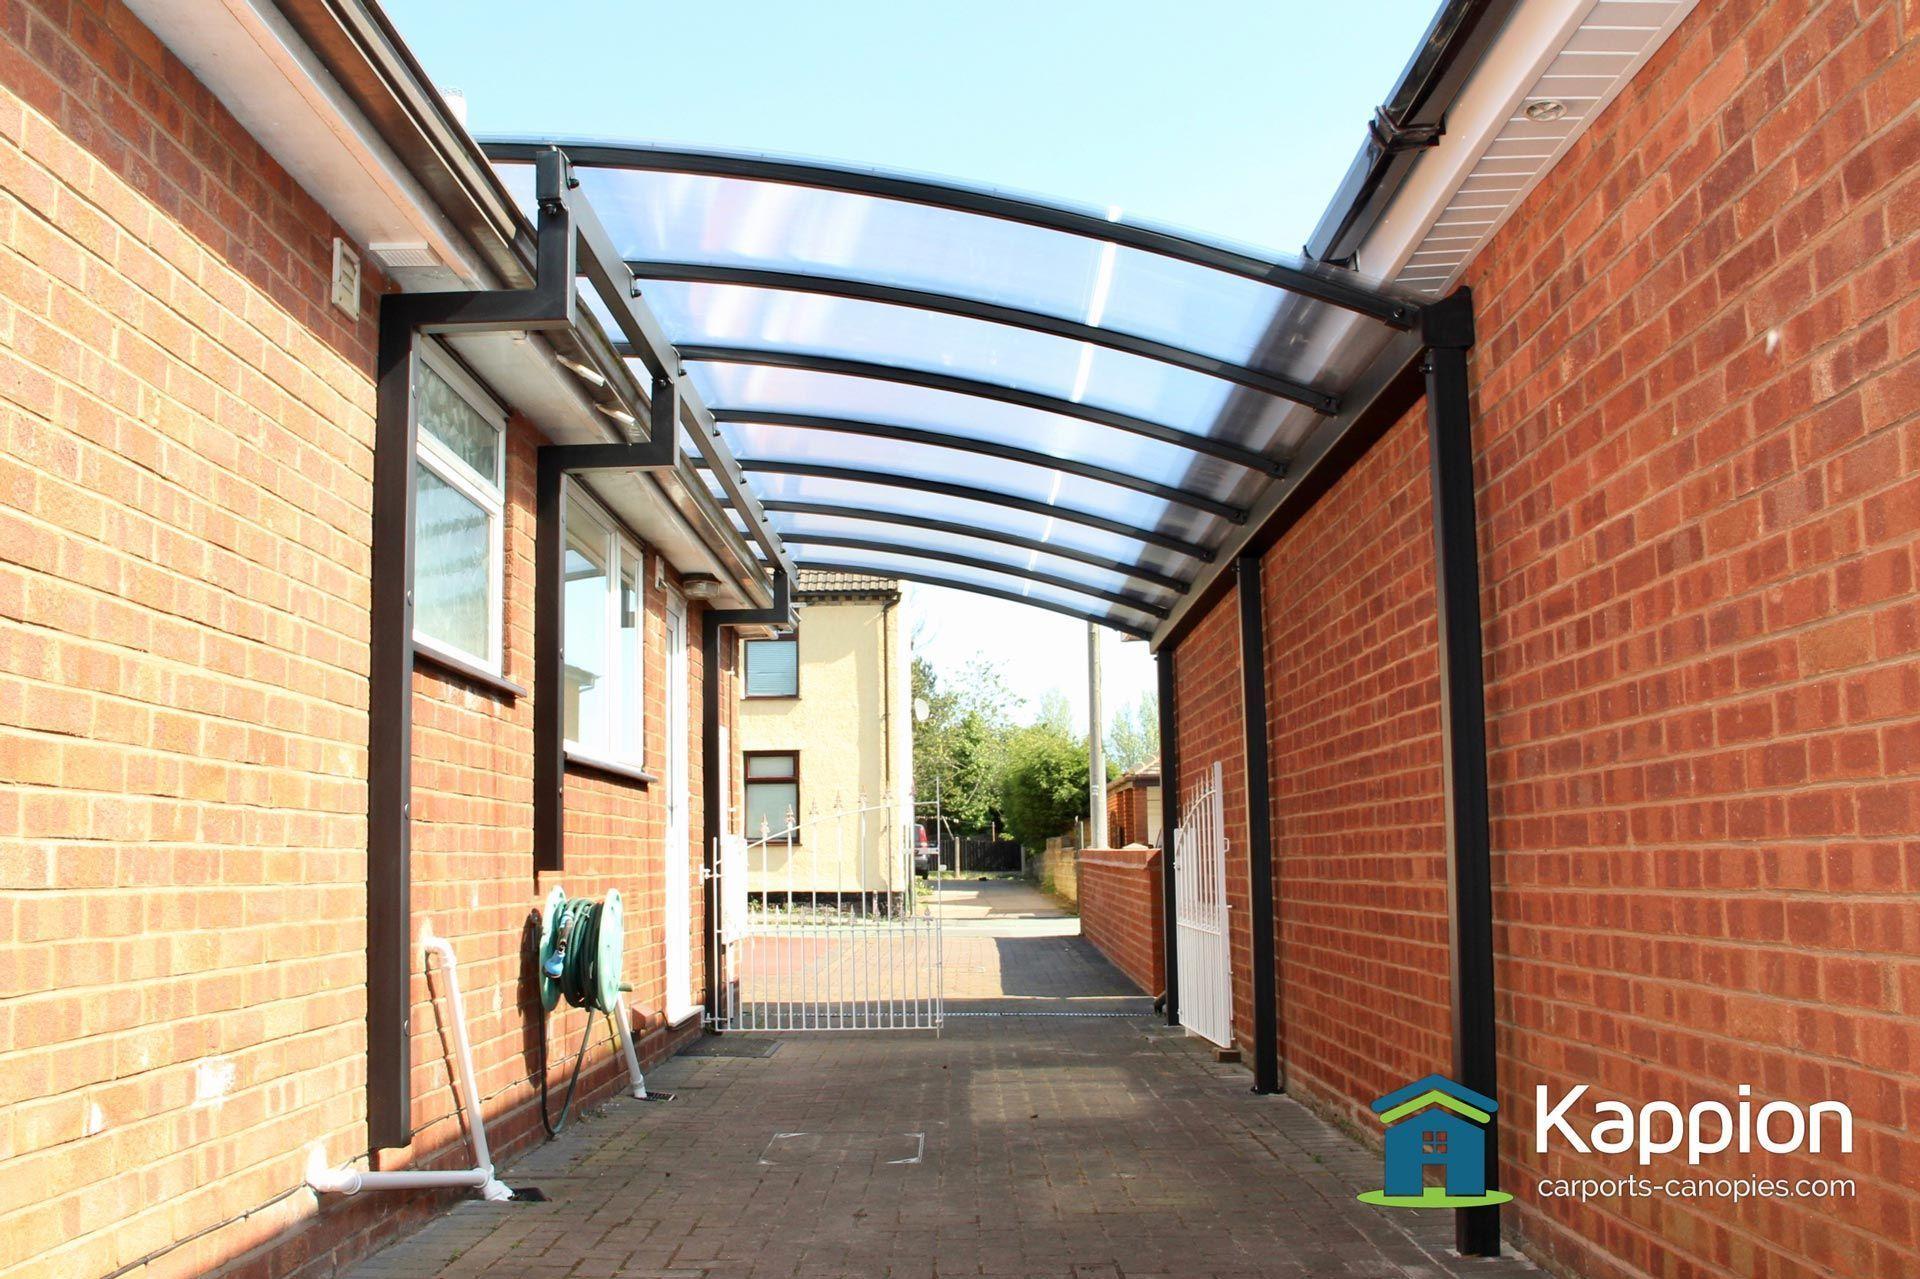 Carport Planning Permission in 2020 Carport canopy